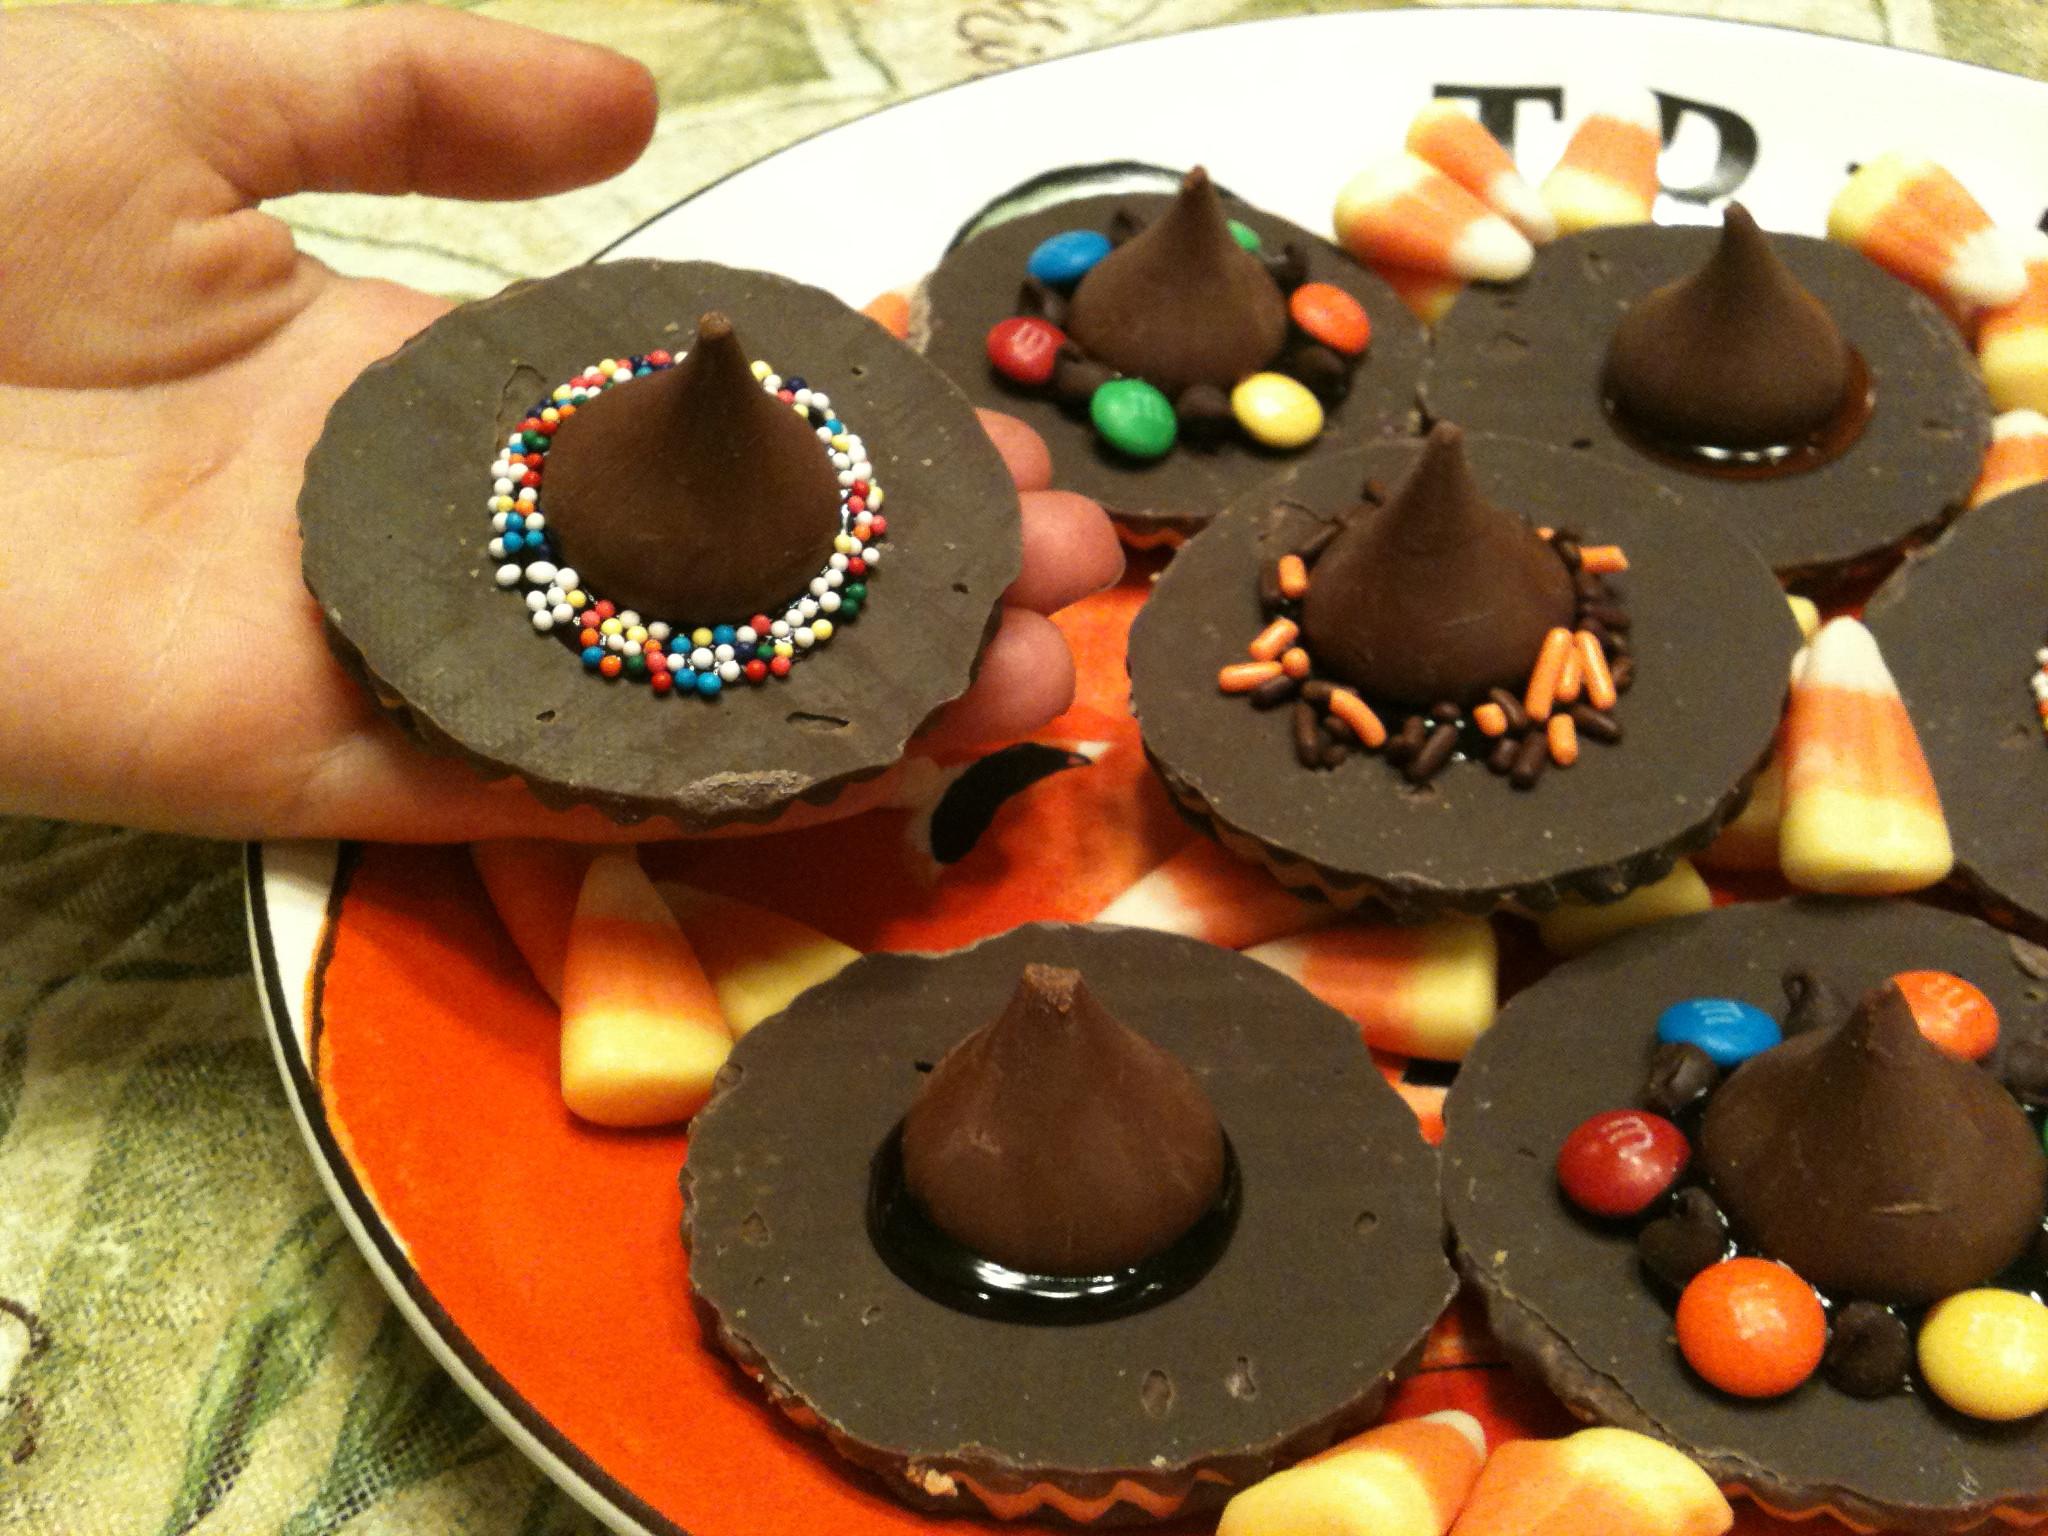 Halloween Cookies Recipes Easy  Last Minute No Bake Halloween Treats Juggling with Julia